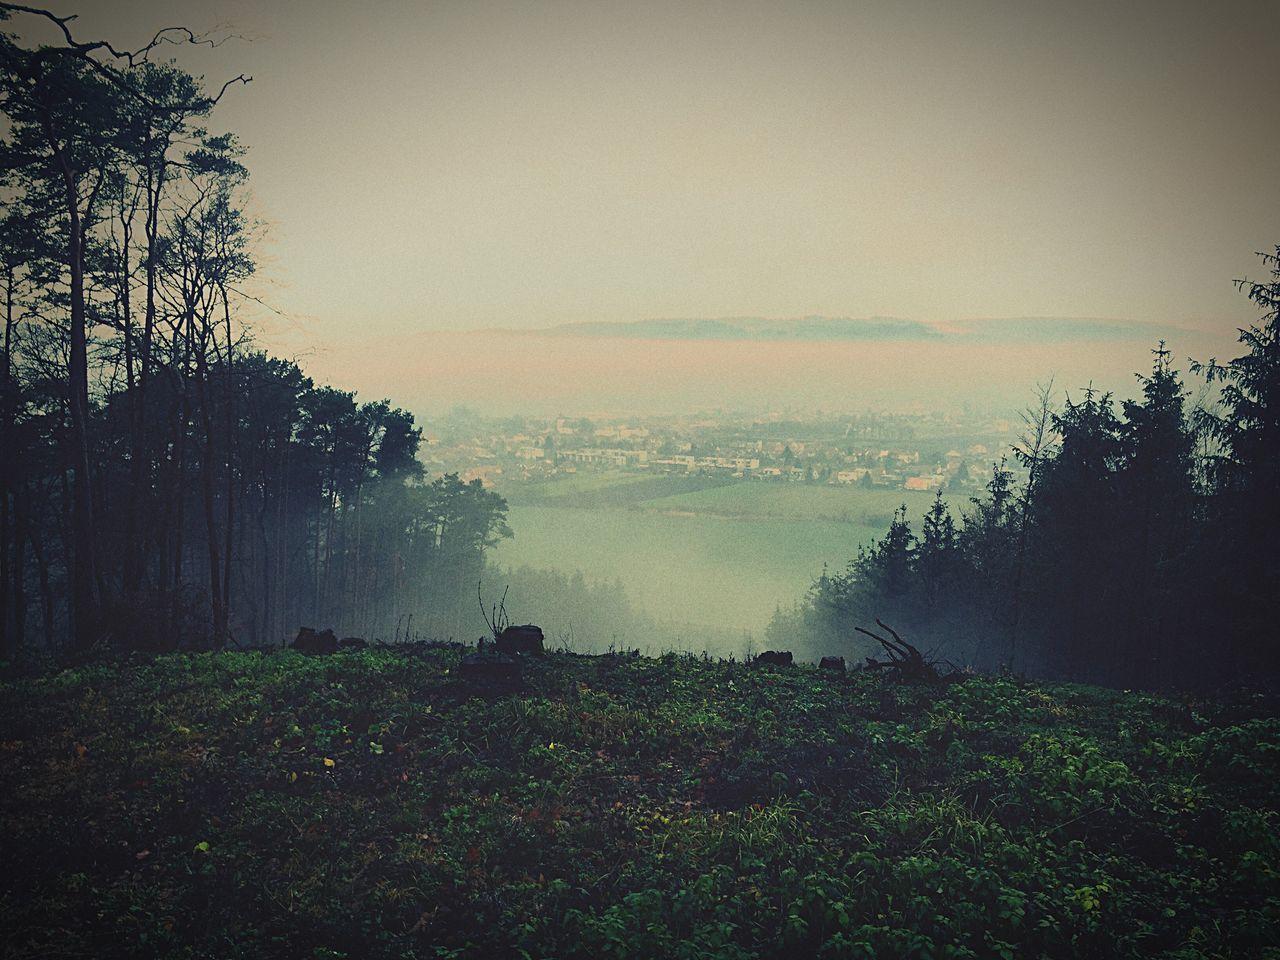 Nature Czech Republic Drásov Sightseeing Forest Fog Hill